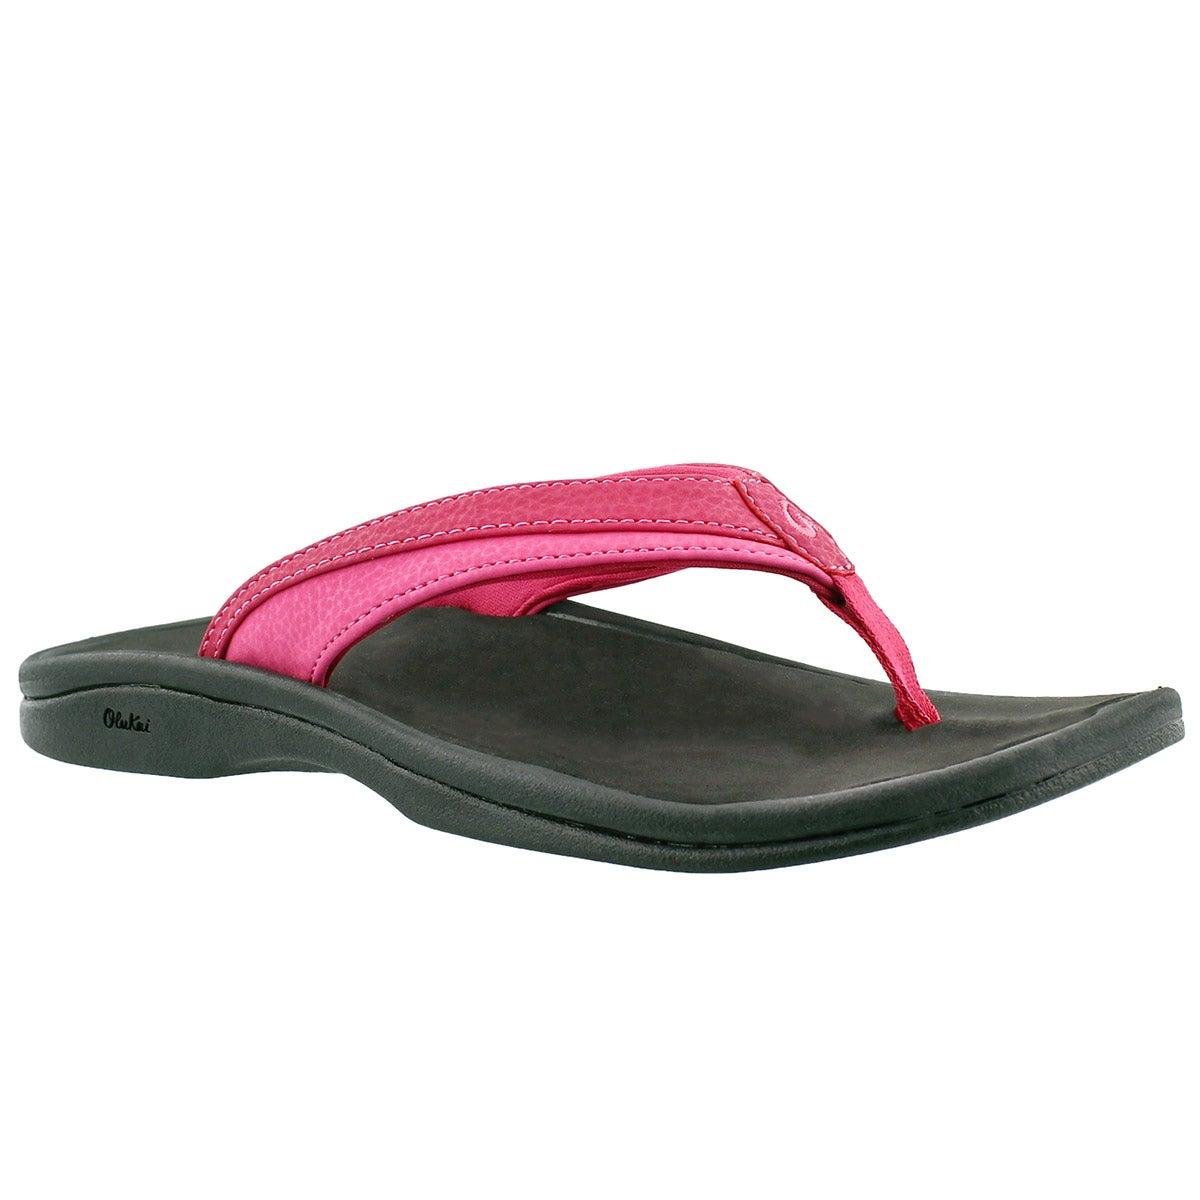 Lds Ohana punch thong sandal